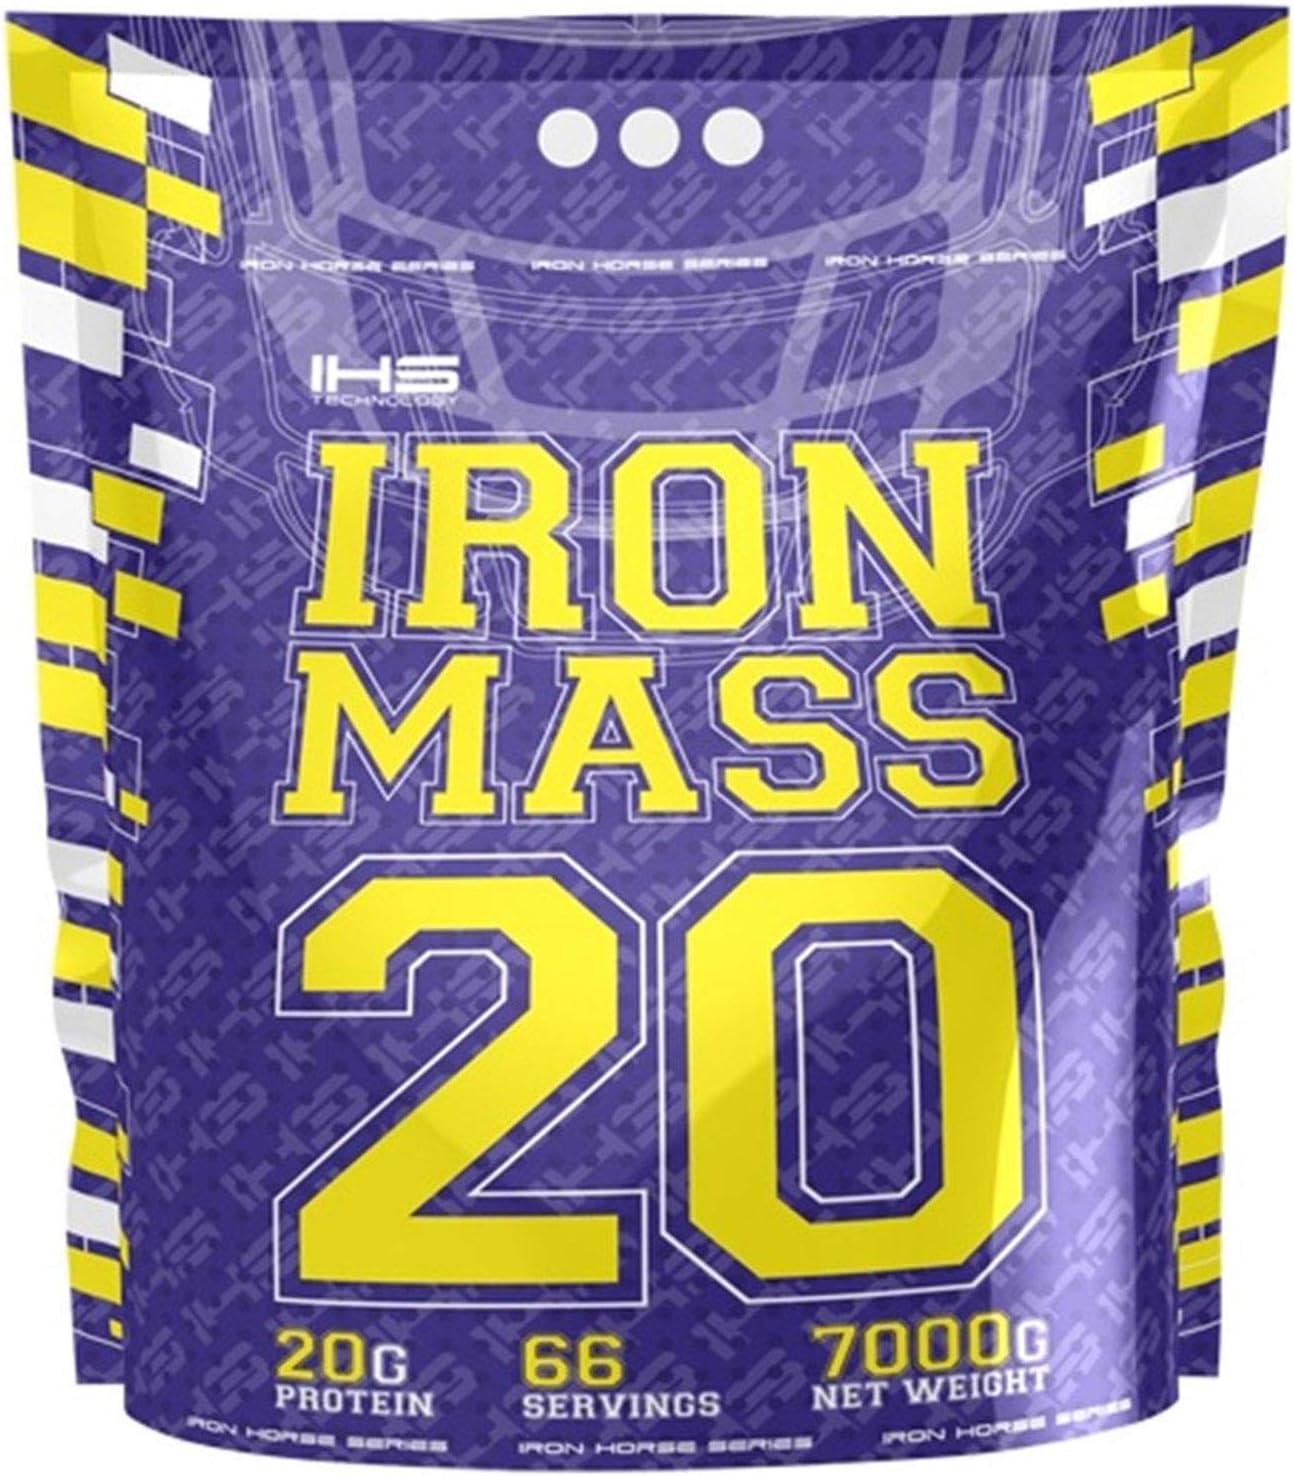 Iron Horse Mass Gainer Whey Protein Powder 1 x 7000g pack Aumento de masa Carbohidratos Carbohydrates (Vanilla)